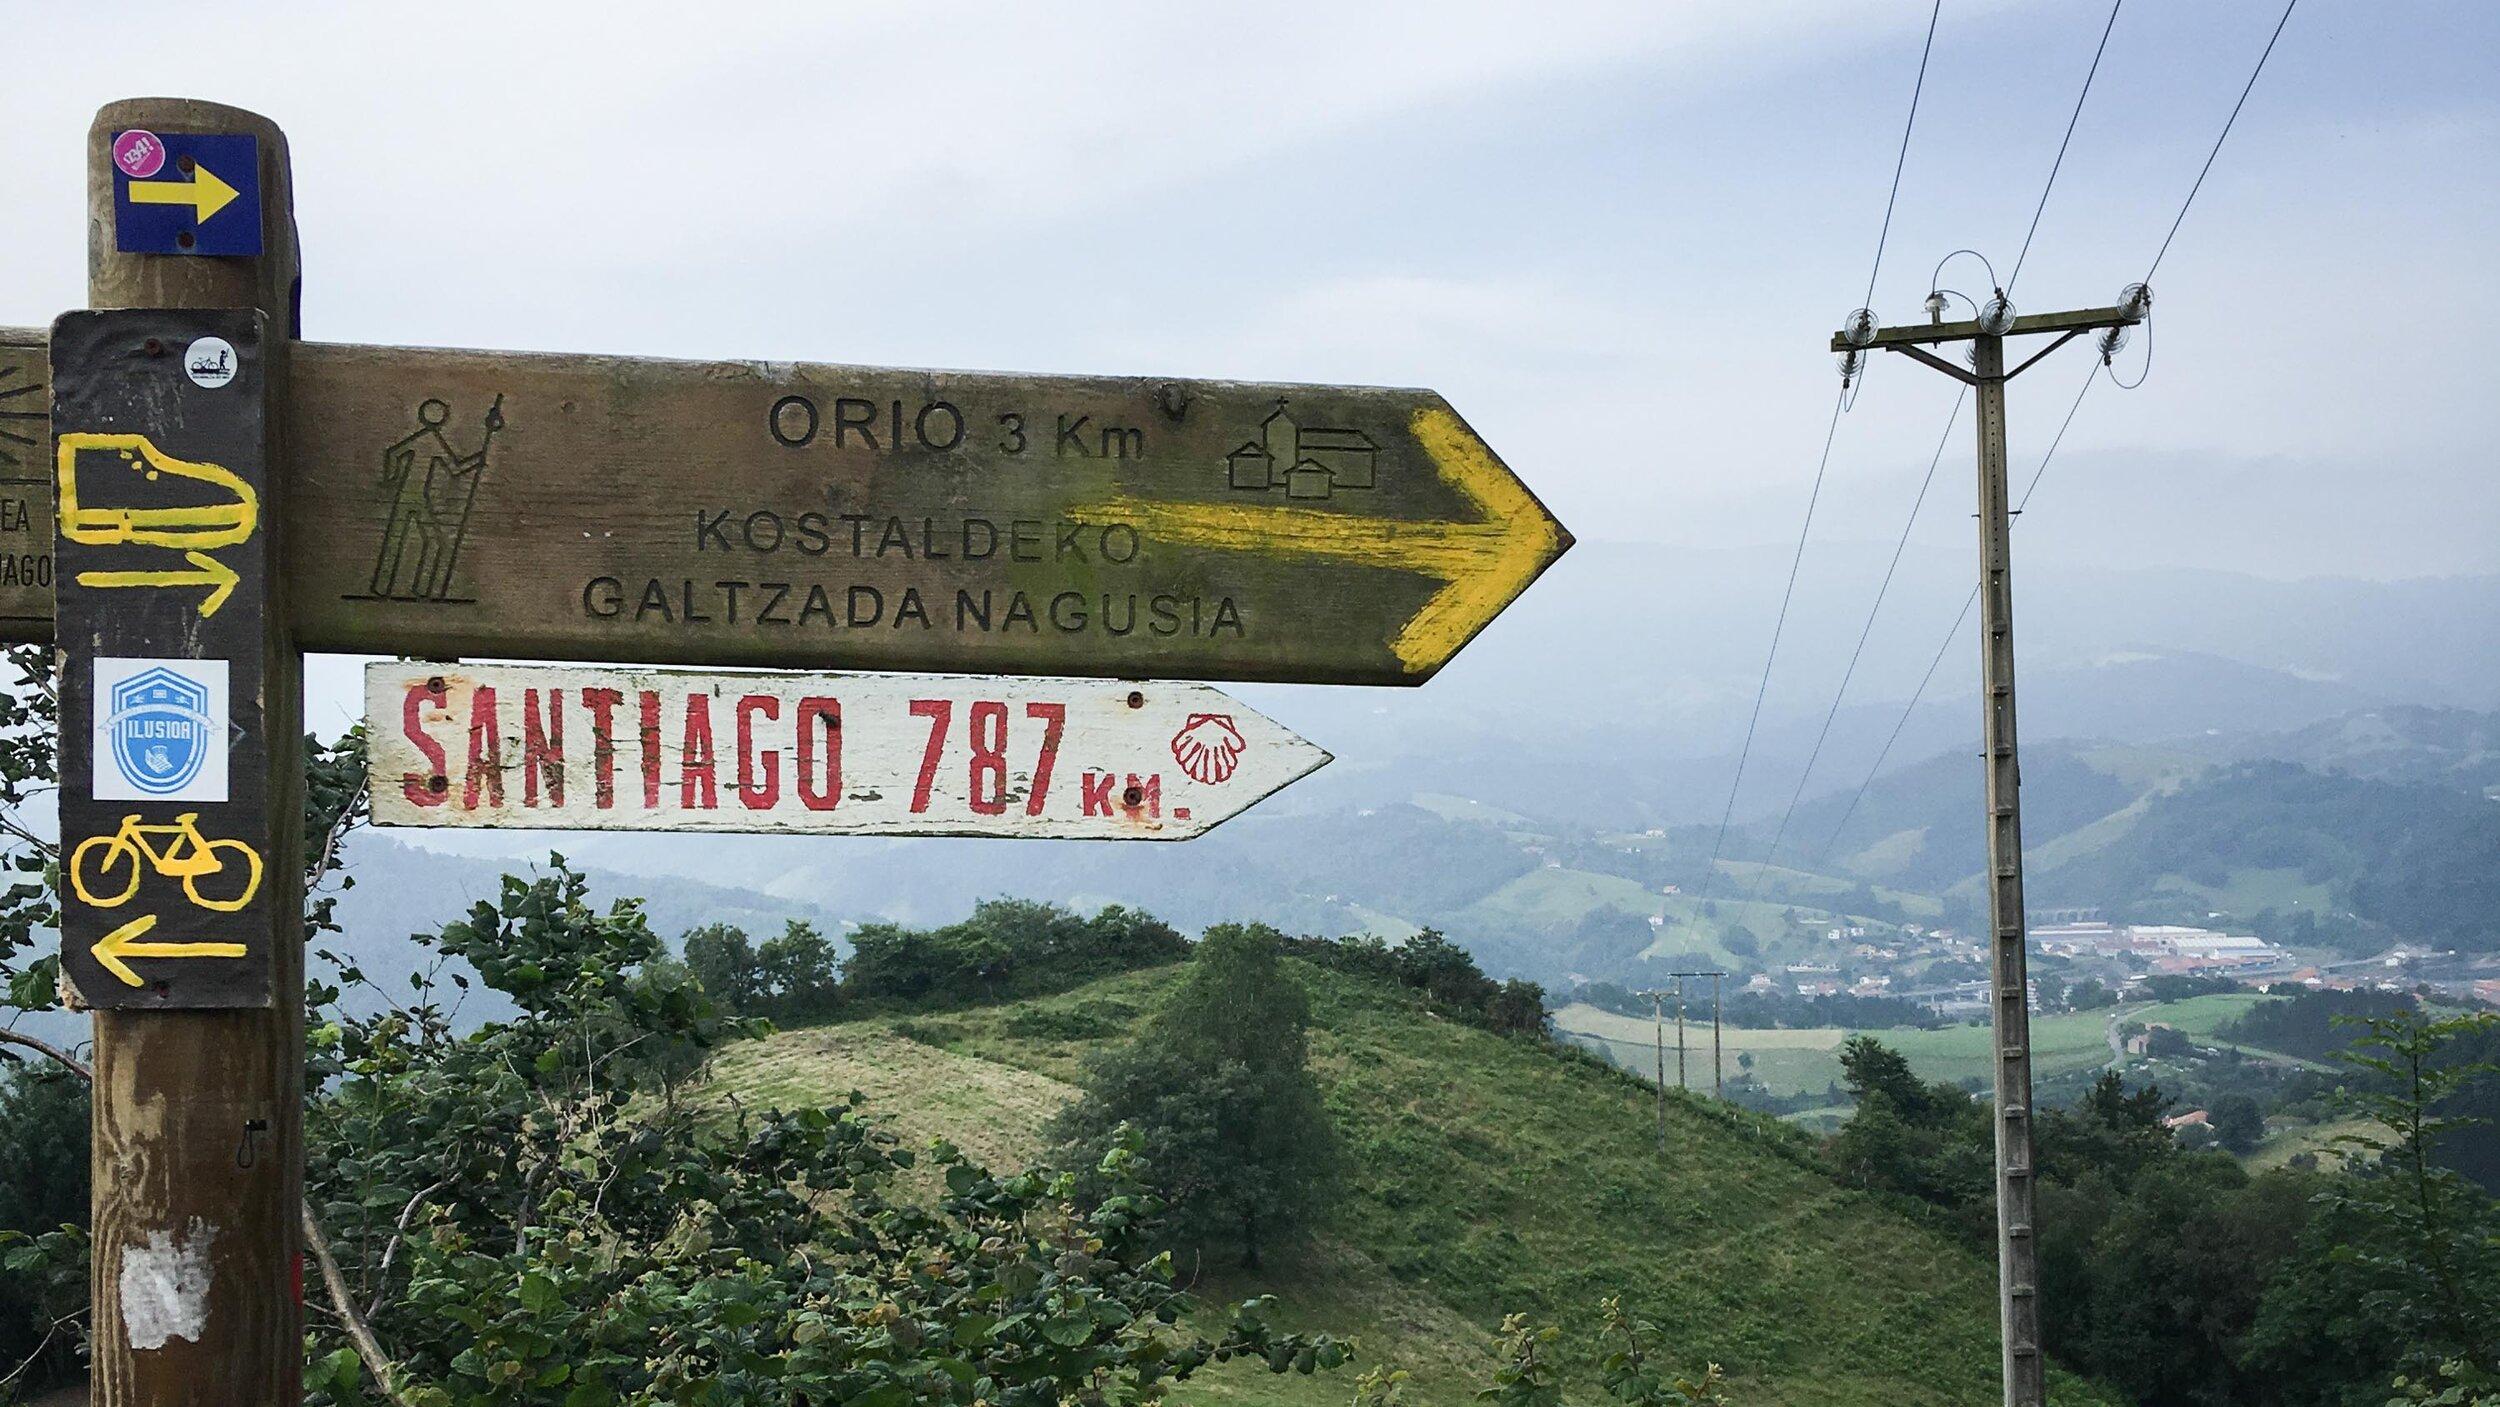 Yellow arrows guide pilgrims to their destination on the Camino de Santiago. (Photo by Fran Turauskis)